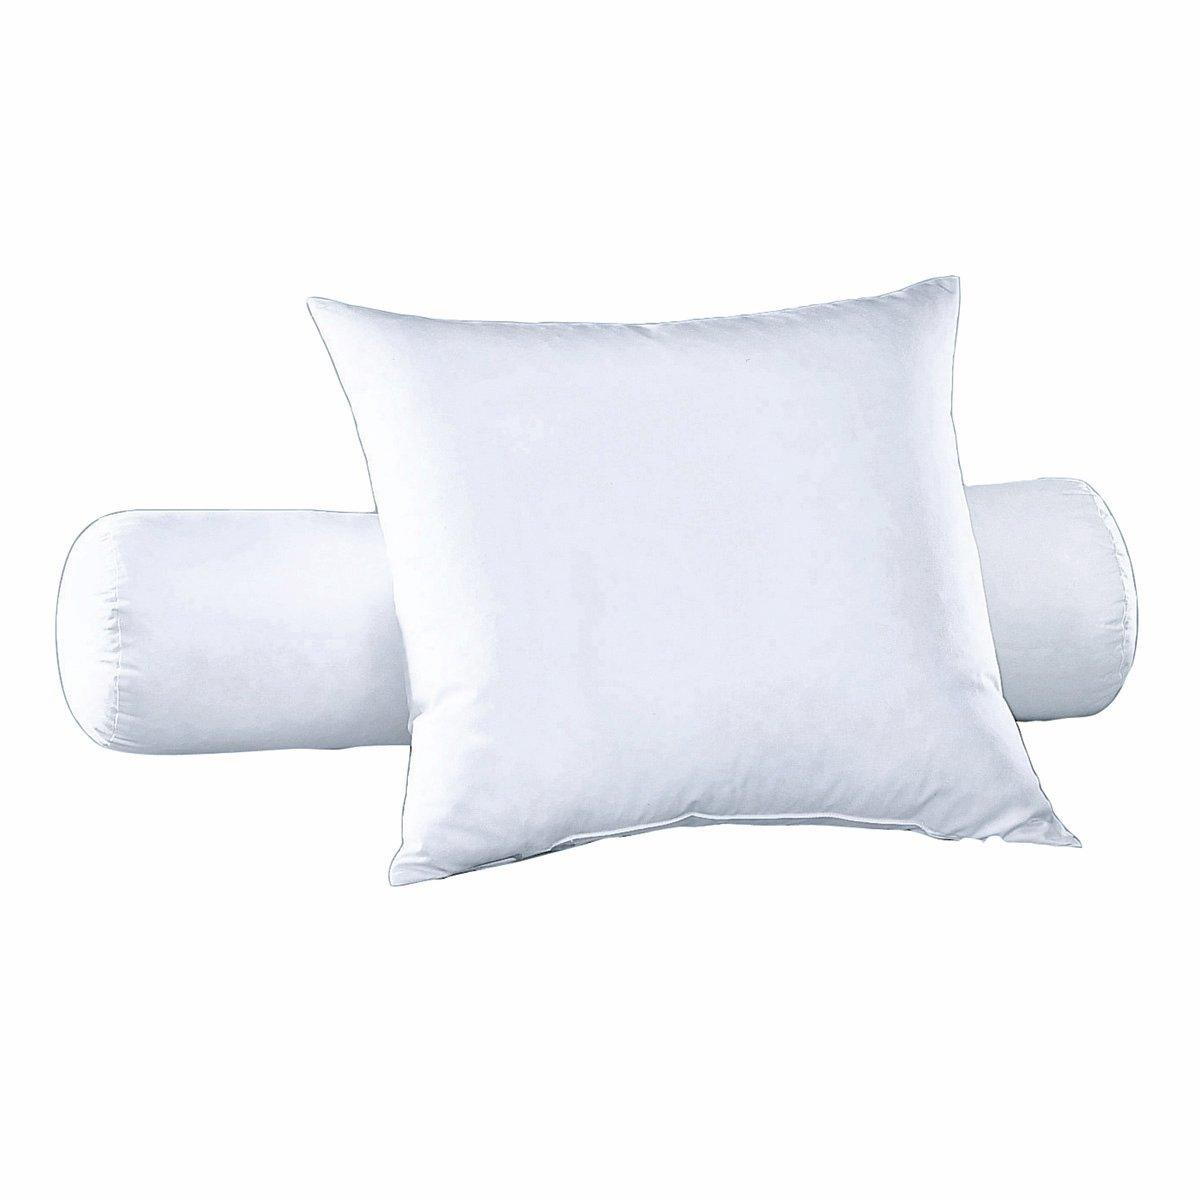 Подушка-валик Hollofil éco с обработкой Proneem валик из латекса с обработкой proneem